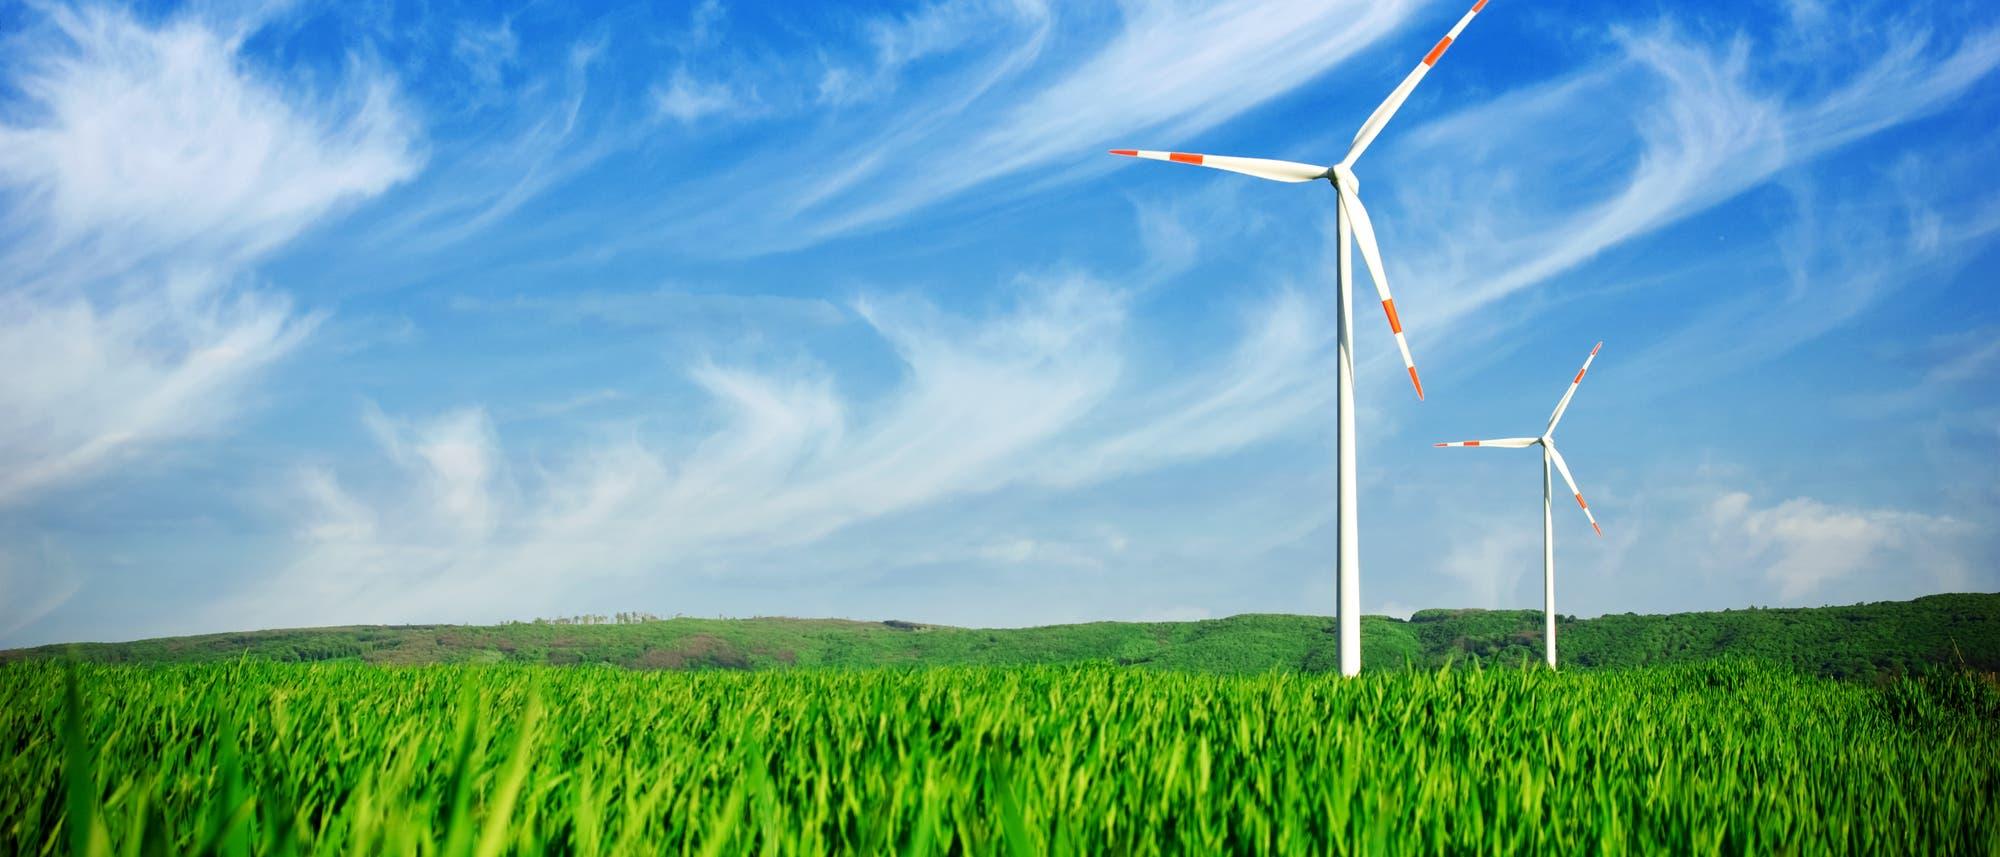 Windkraft auf dem Feld